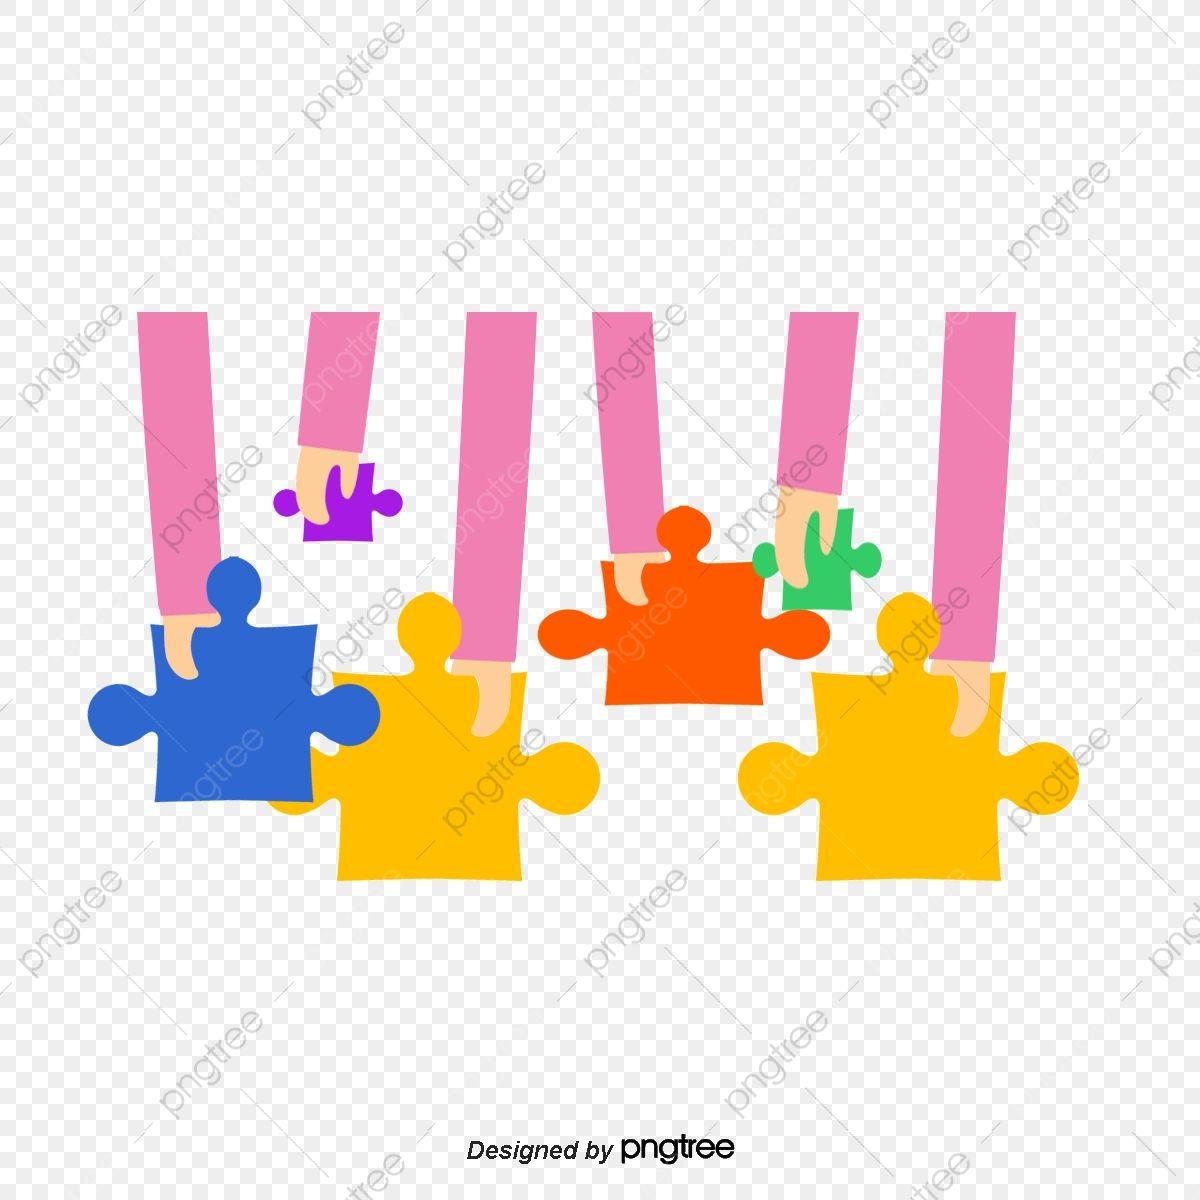 Download This Vector Business Puzzle Module Color Puzzle Pieces Transparent Png Or Vector File For Free P Cute Wallpaper Backgrounds Clip Art Puzzle Pieces